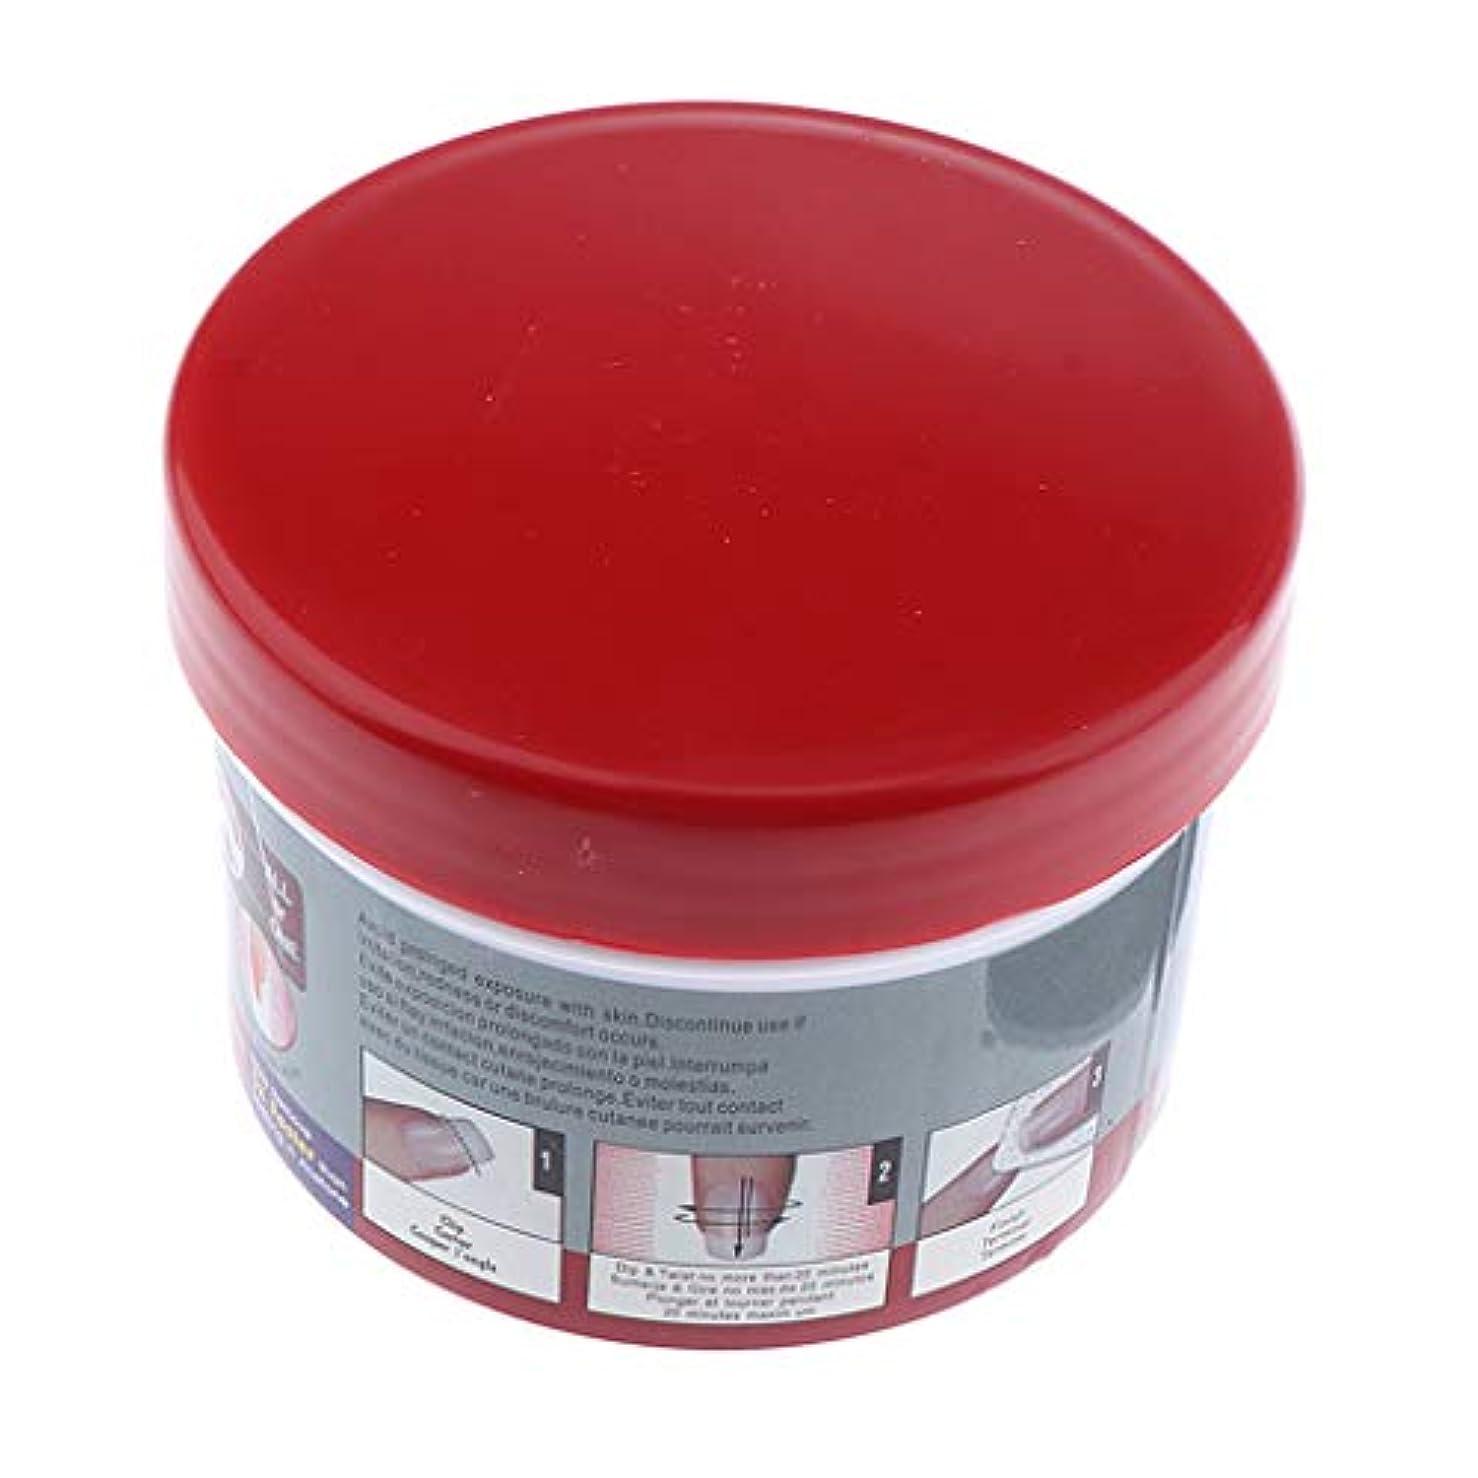 B Baosity マニキュア 除去コンテナツール ネイルアート 耐久性 UVゲル